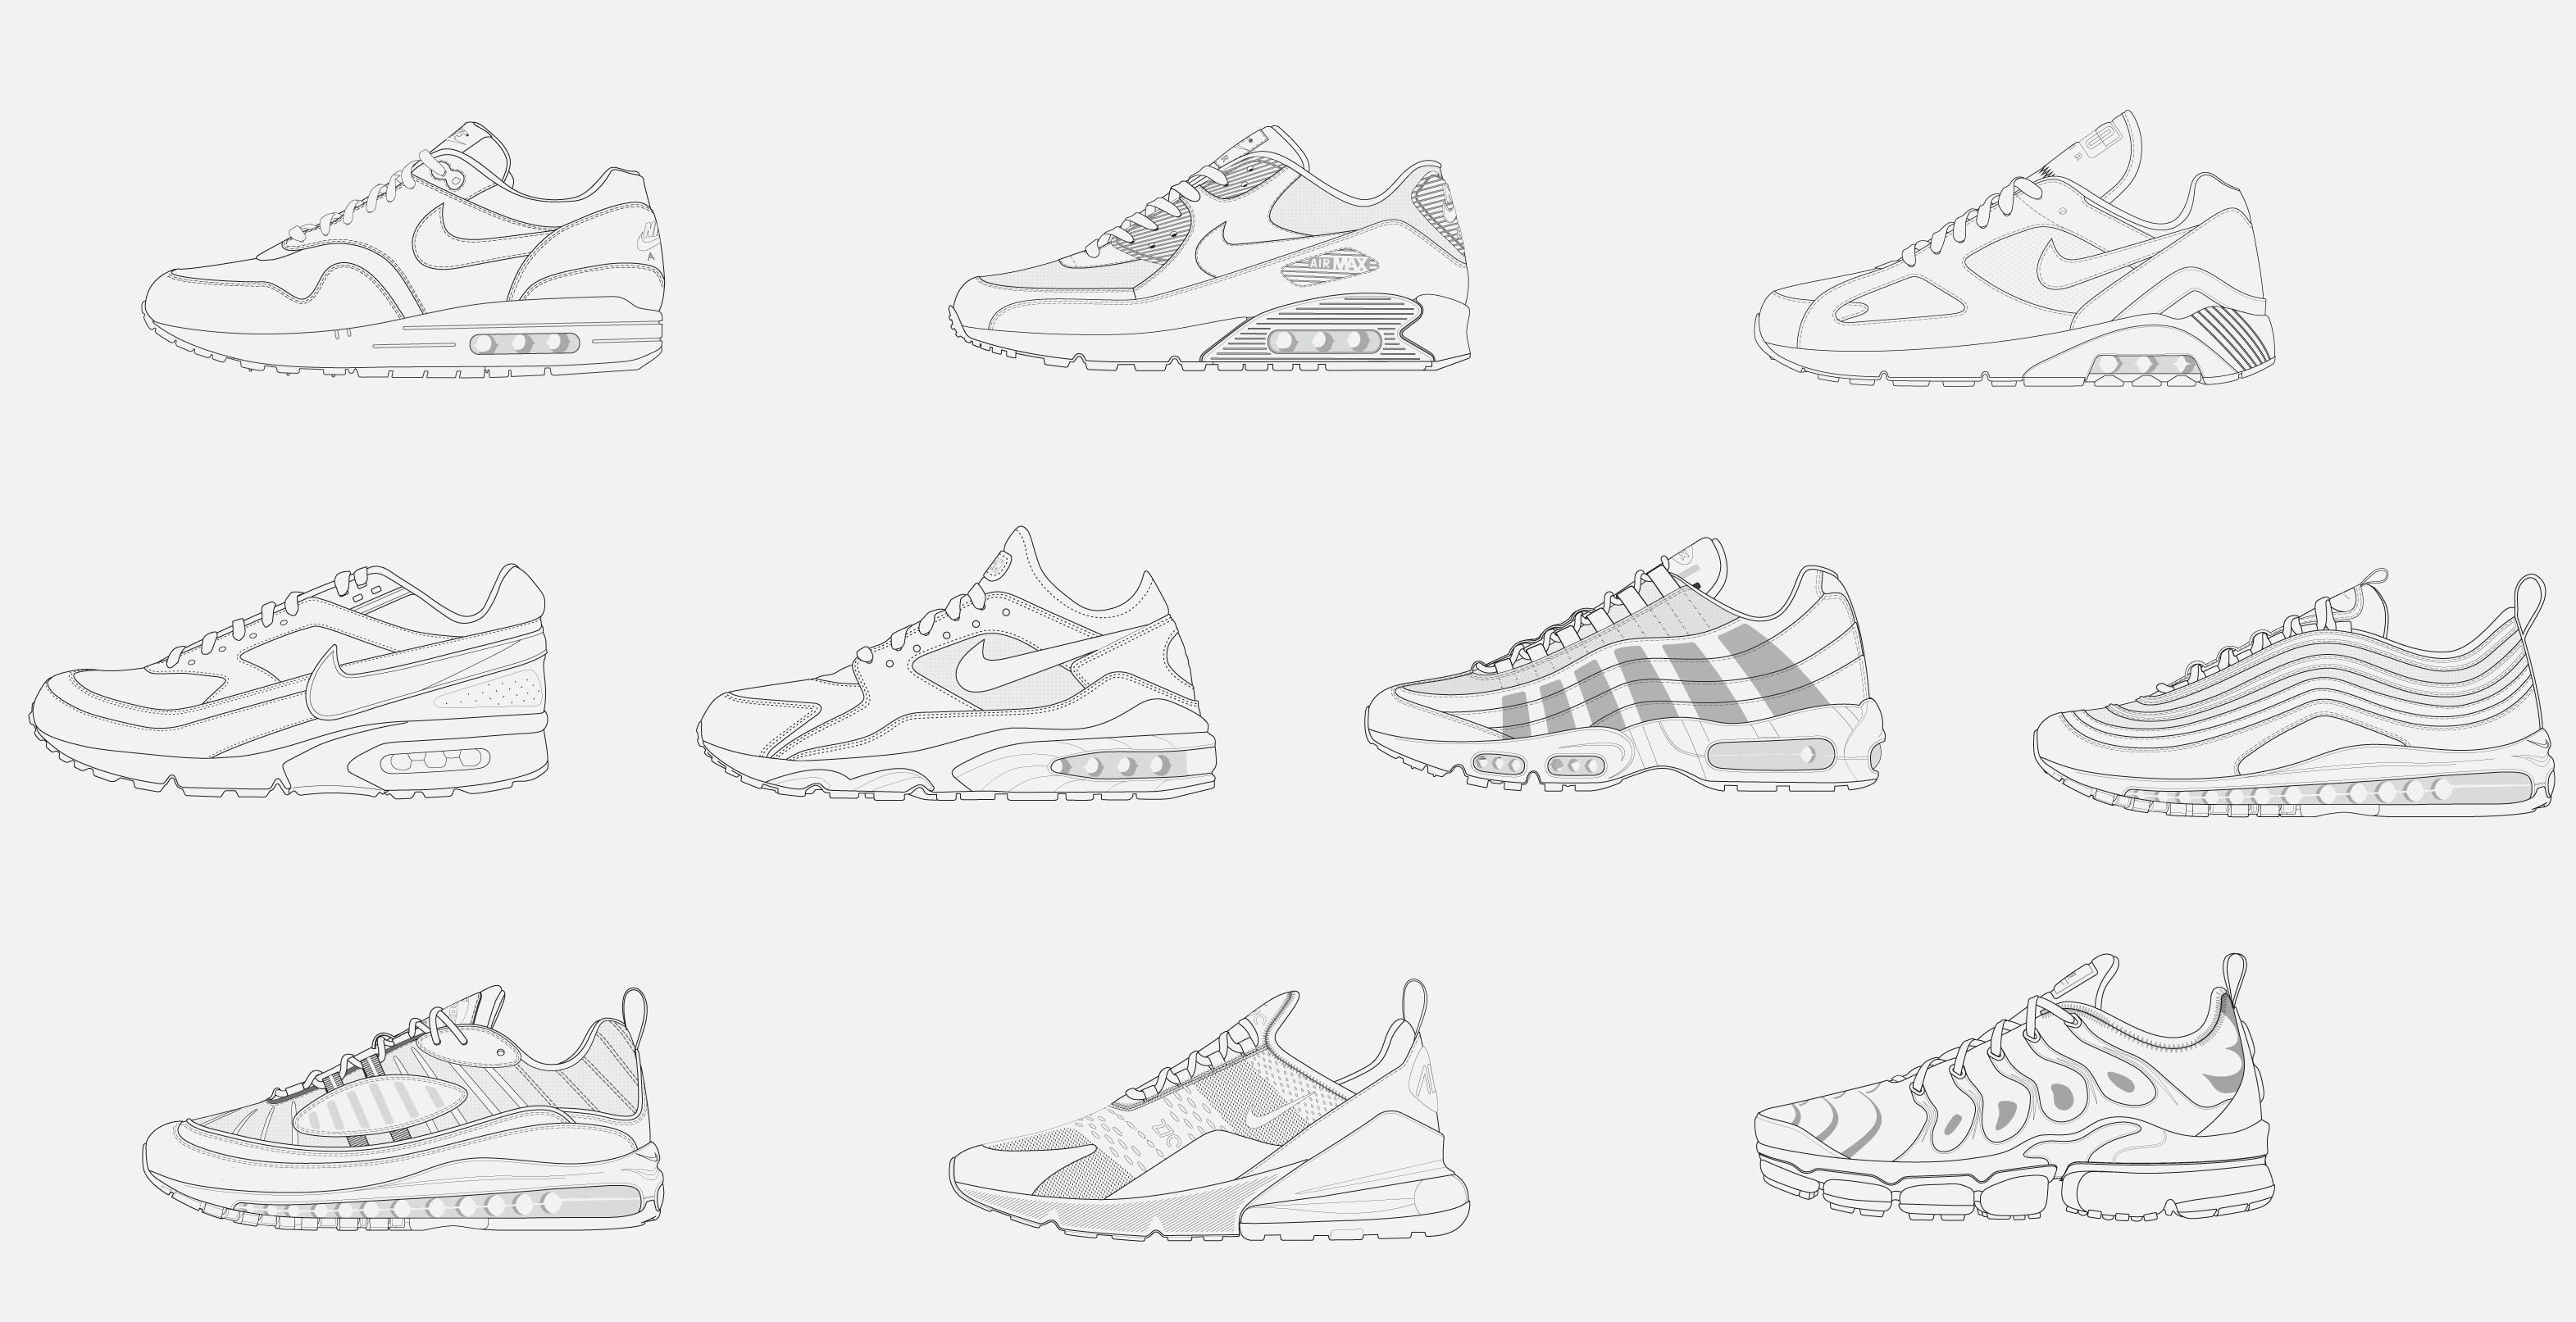 Nike Air Max Day 2018 On Sneaker Design Workshop